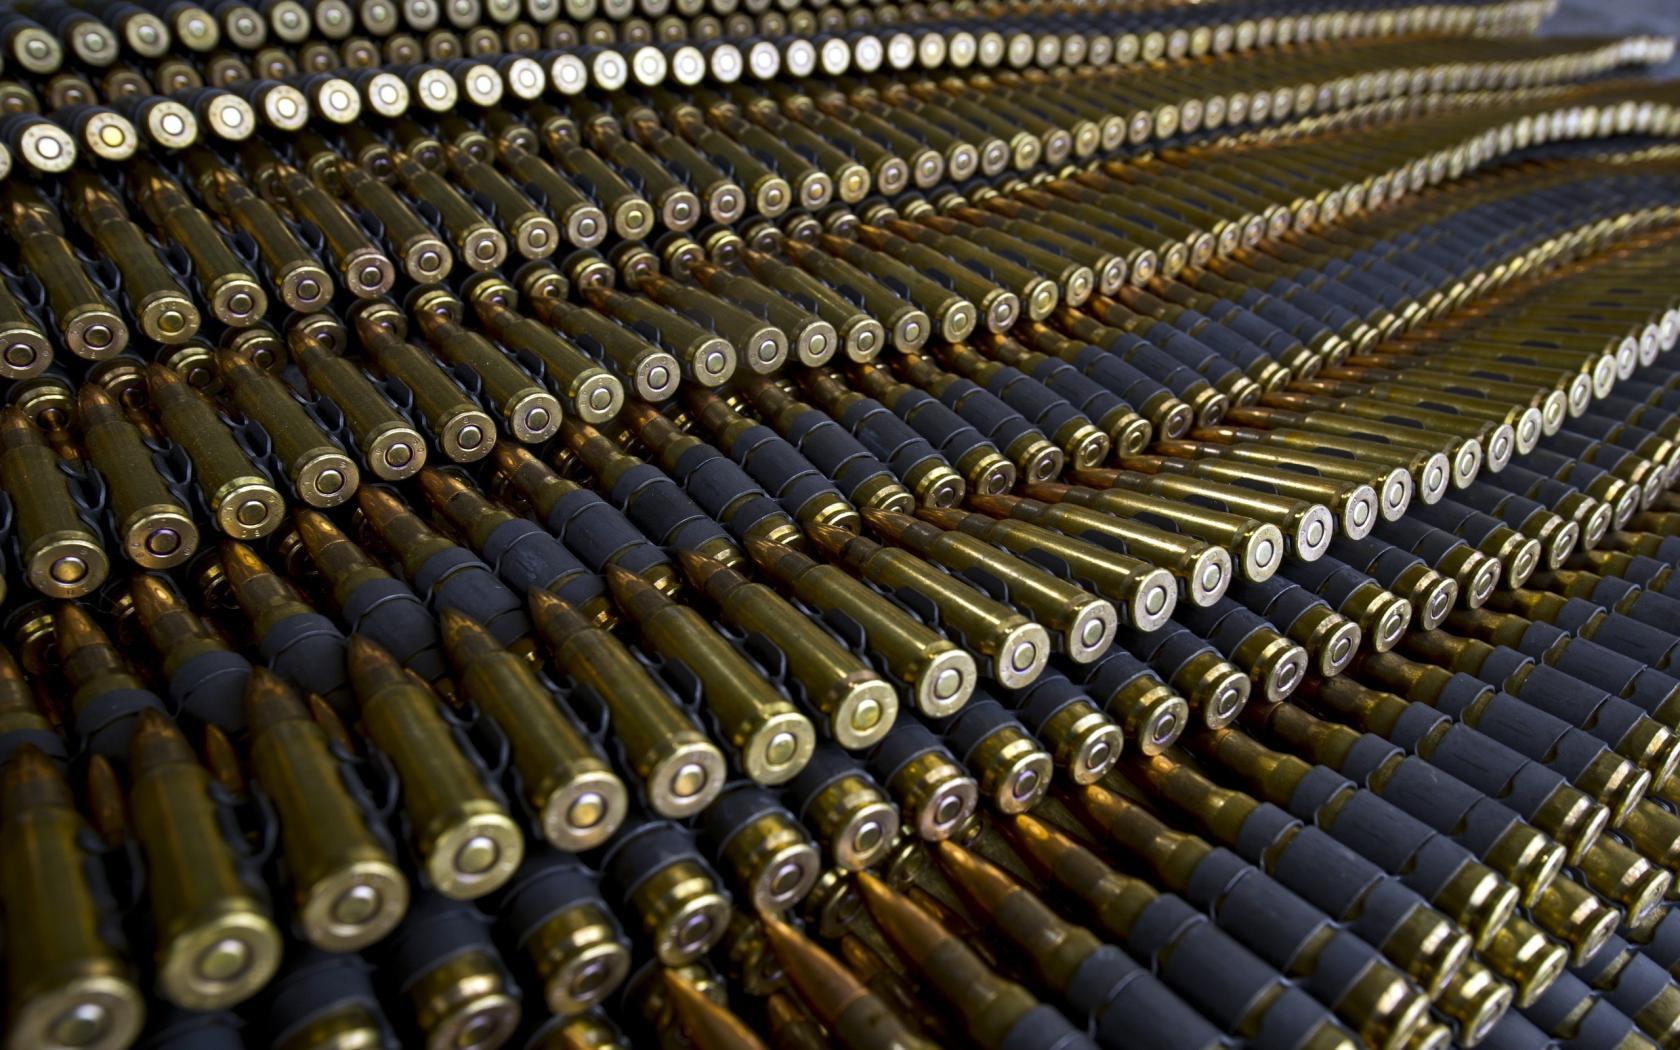 weapons_ammunition_1680x1050_44373